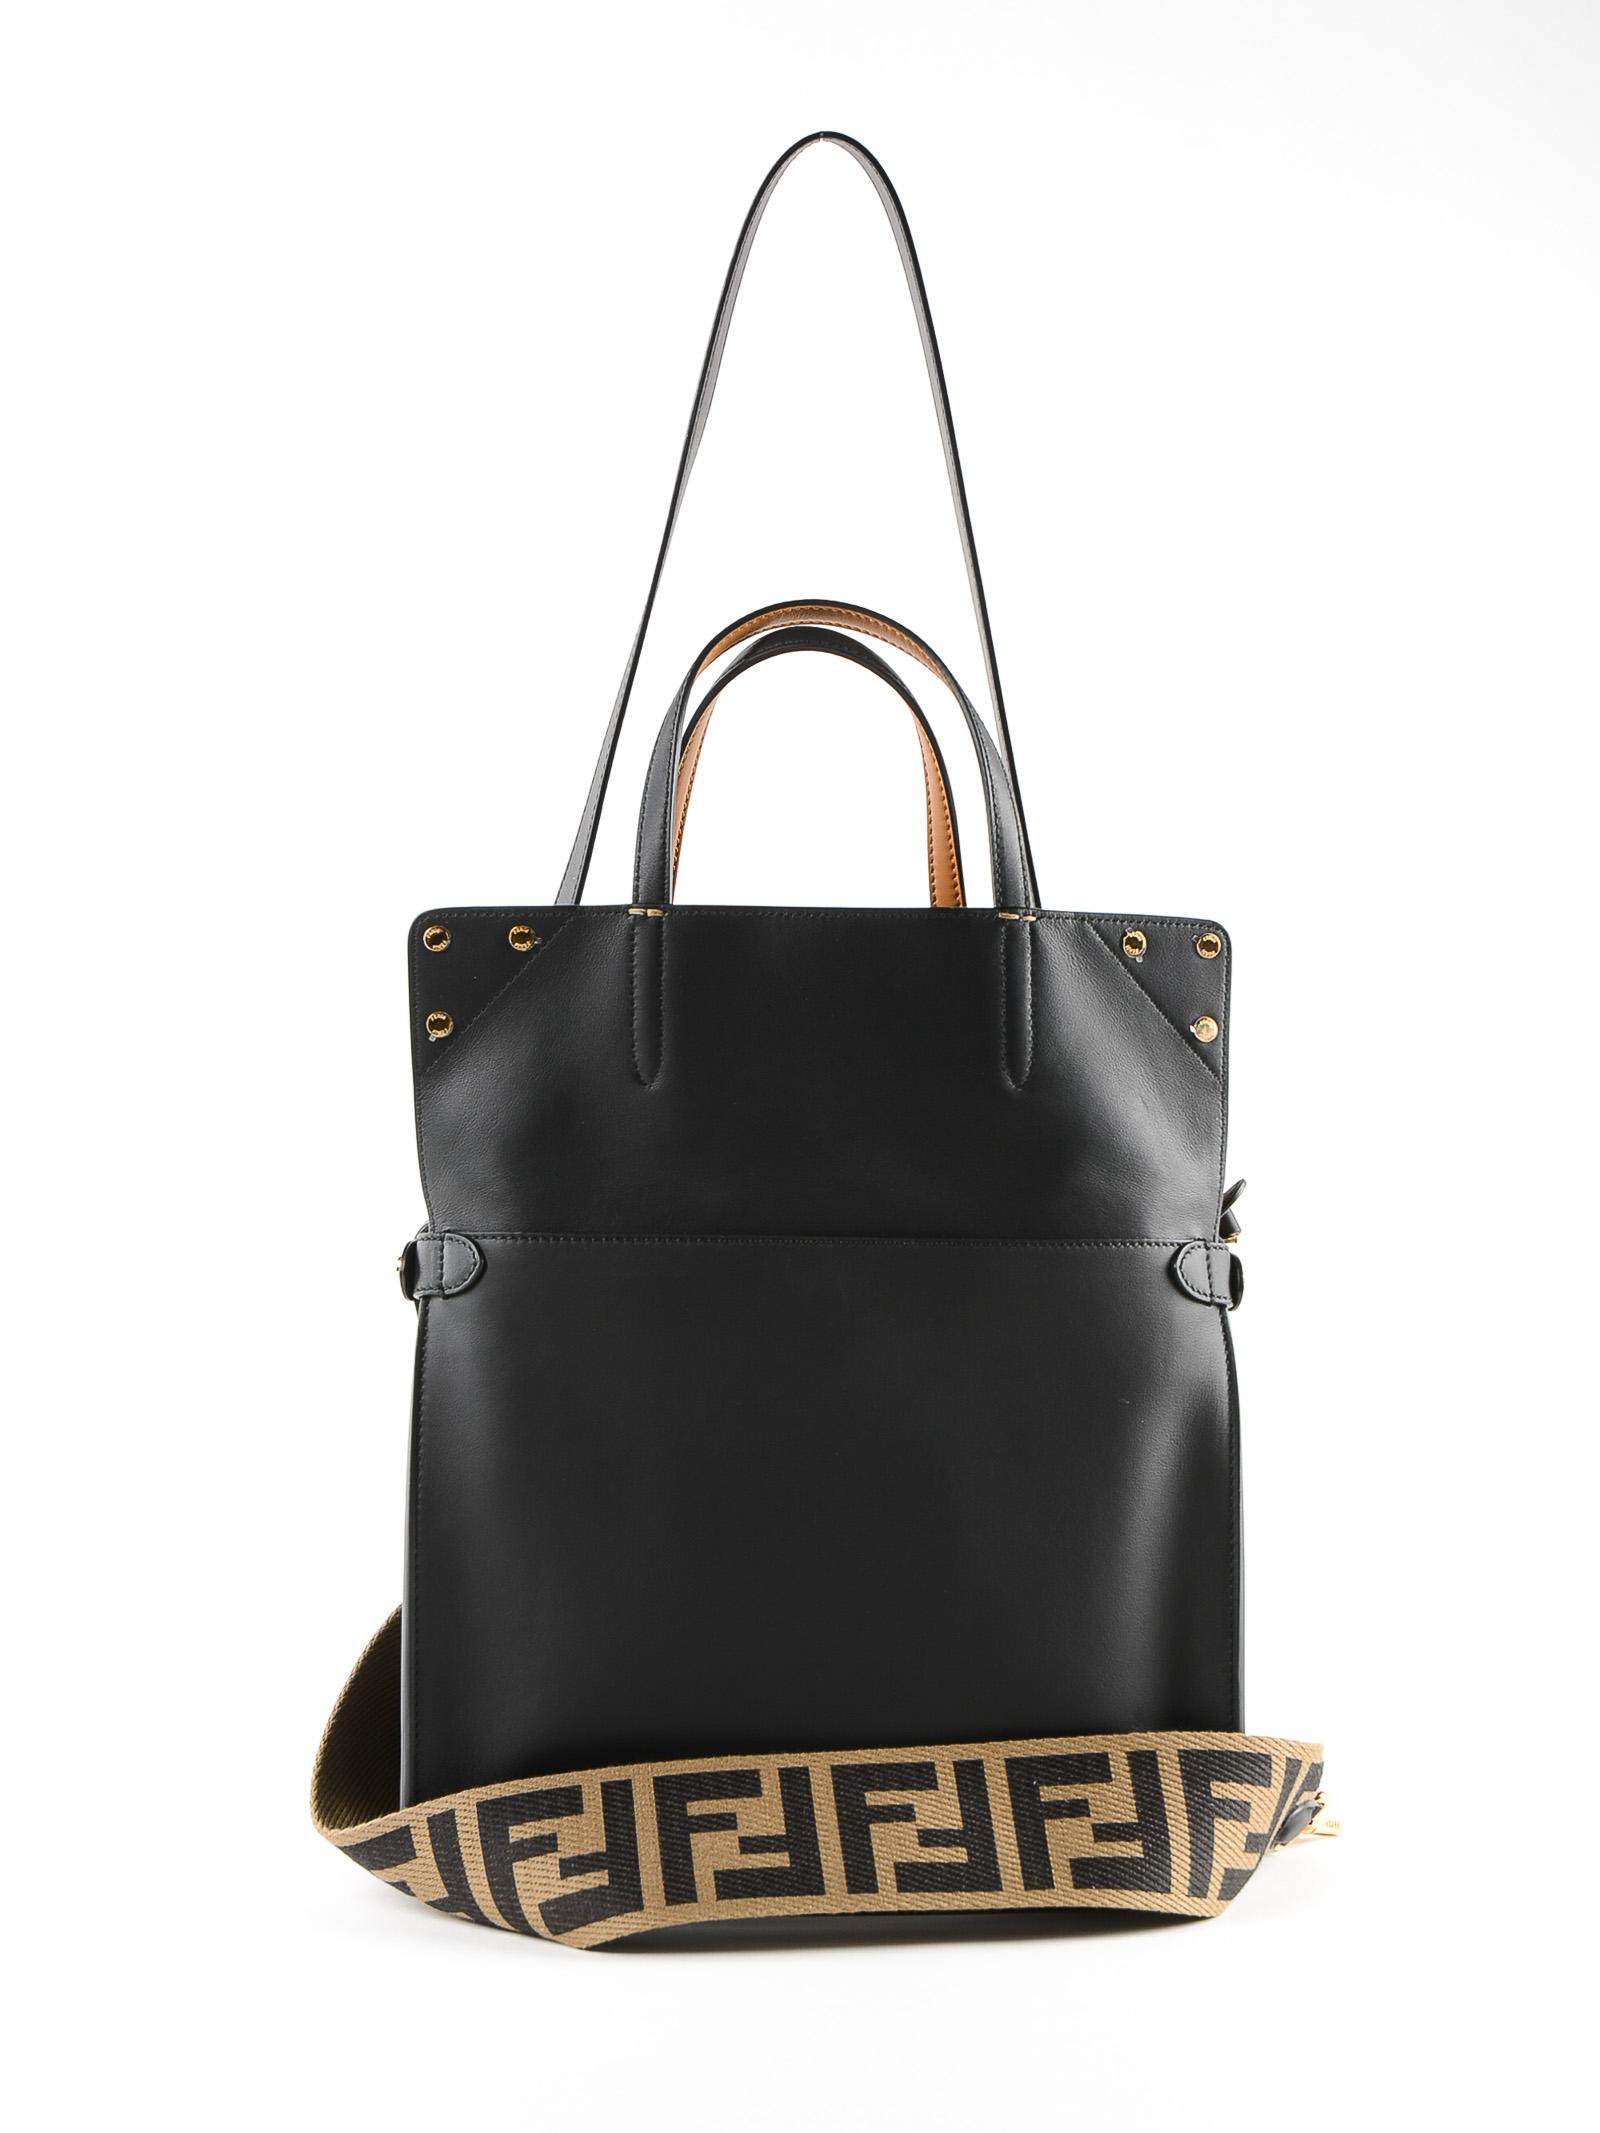 8b2d580648a0 Fendi - Black Flip Regular Bag - Lyst. View fullscreen